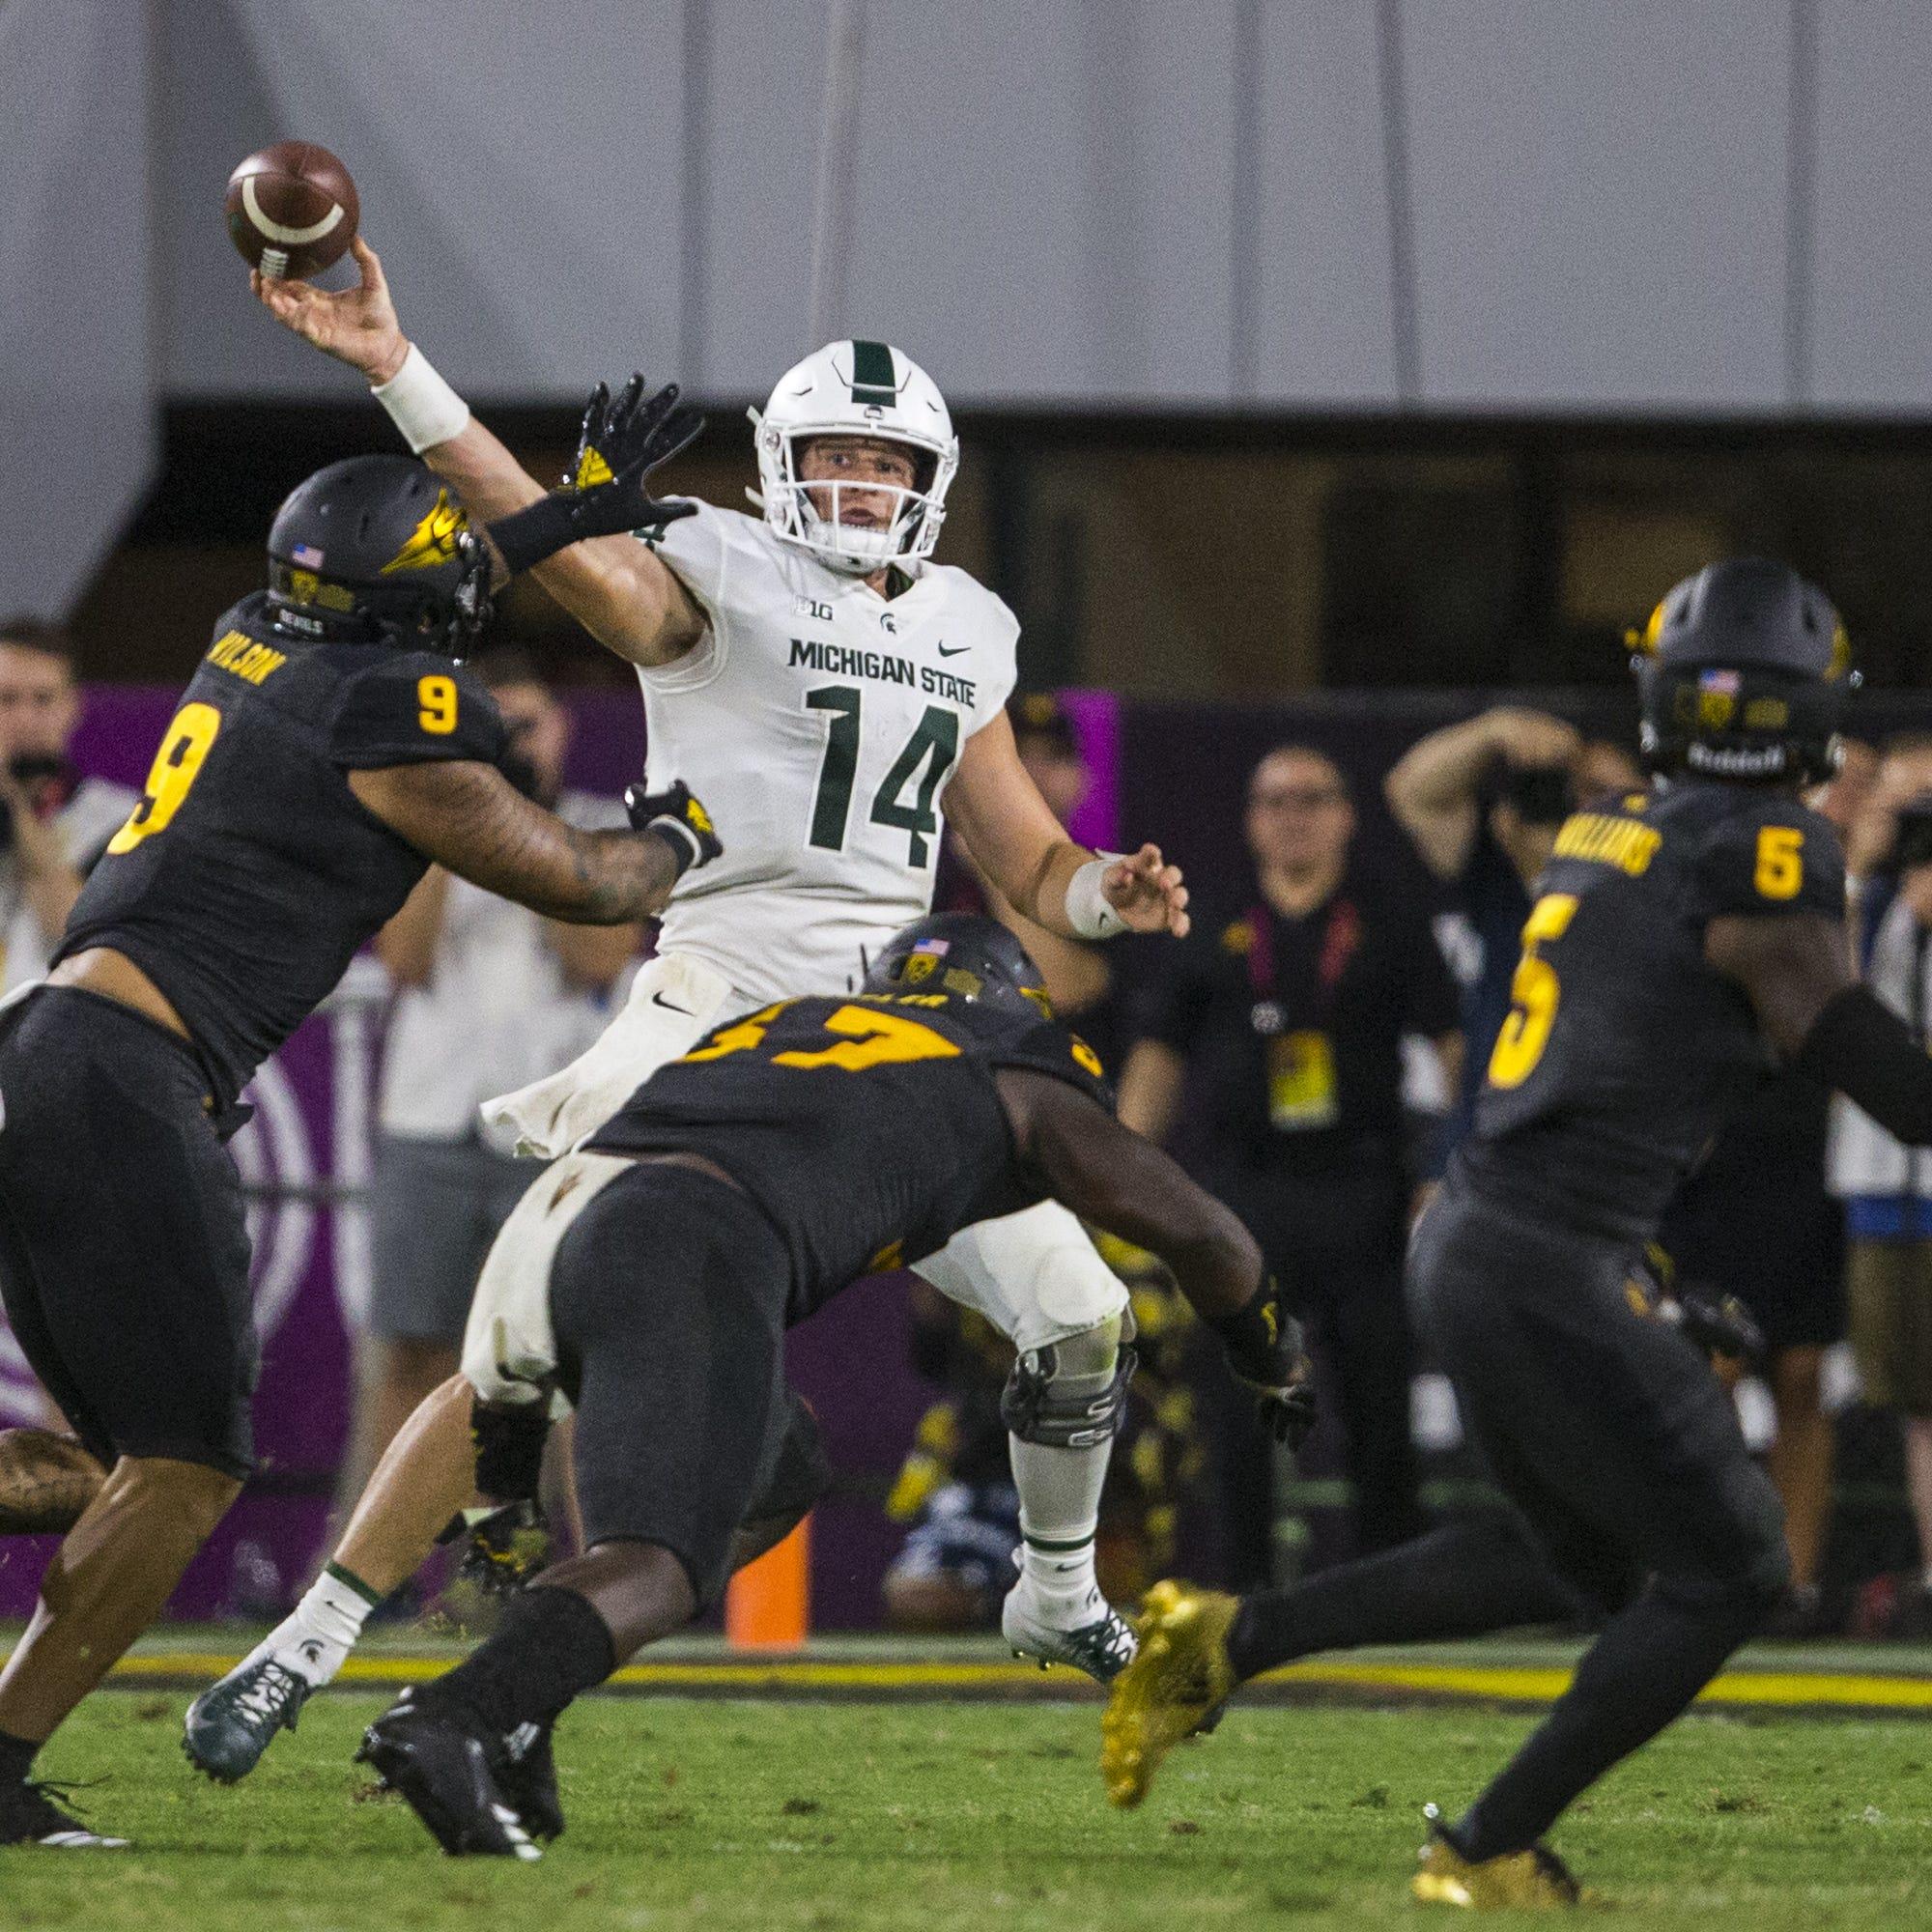 Arizona State radio guy: Michigan State must out-muscle, run over Oregon